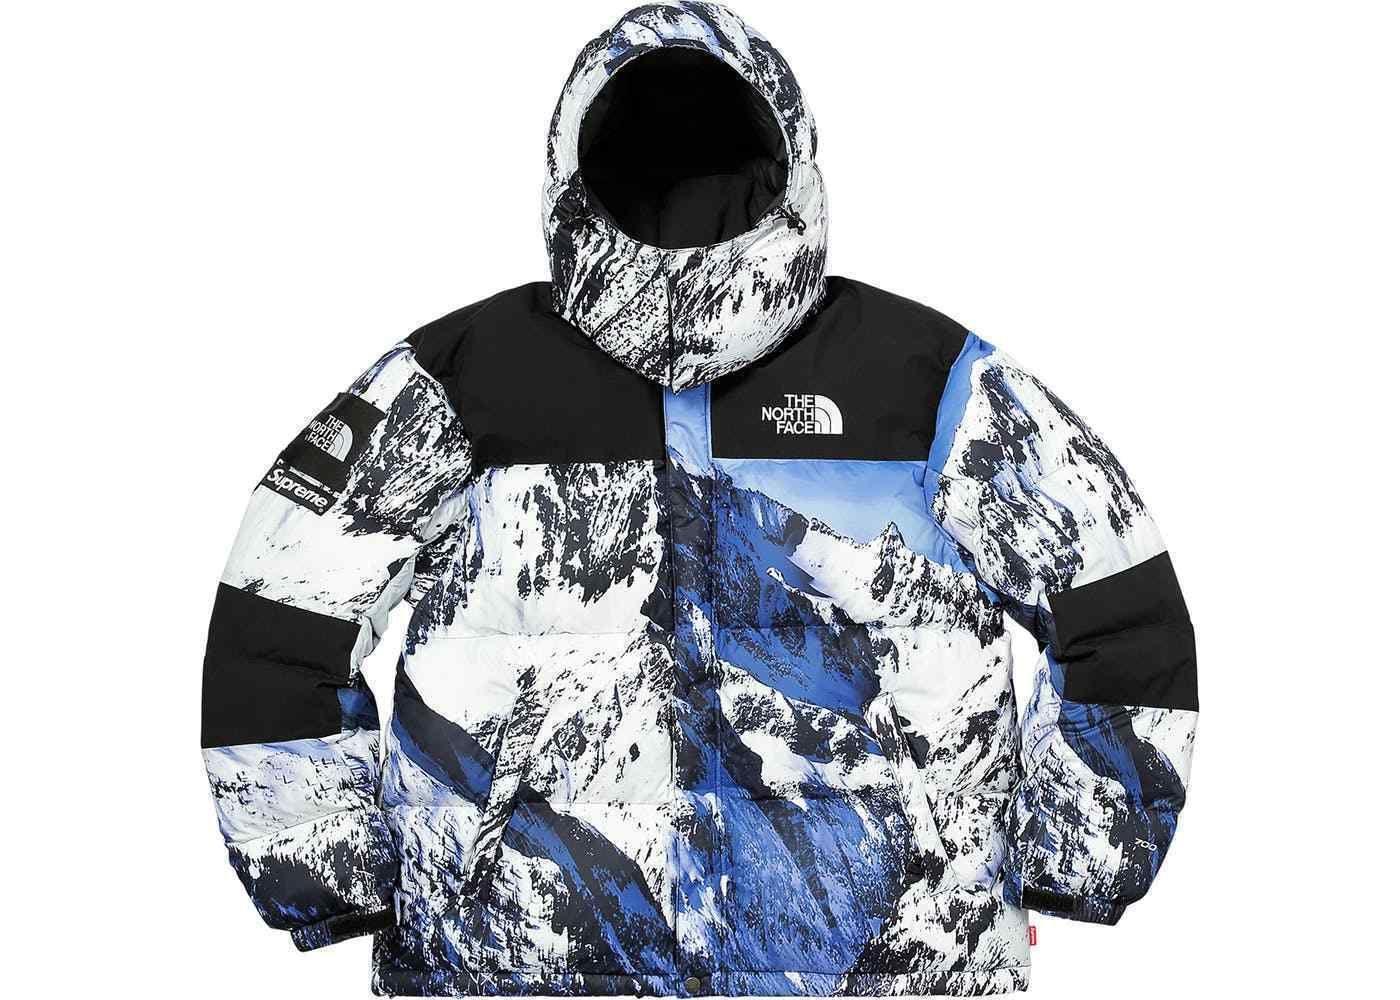 Supreme X North Face Mountain Baltoro Jacket Puffer Tnf Small Parka The North Face Clothes Design Fashion